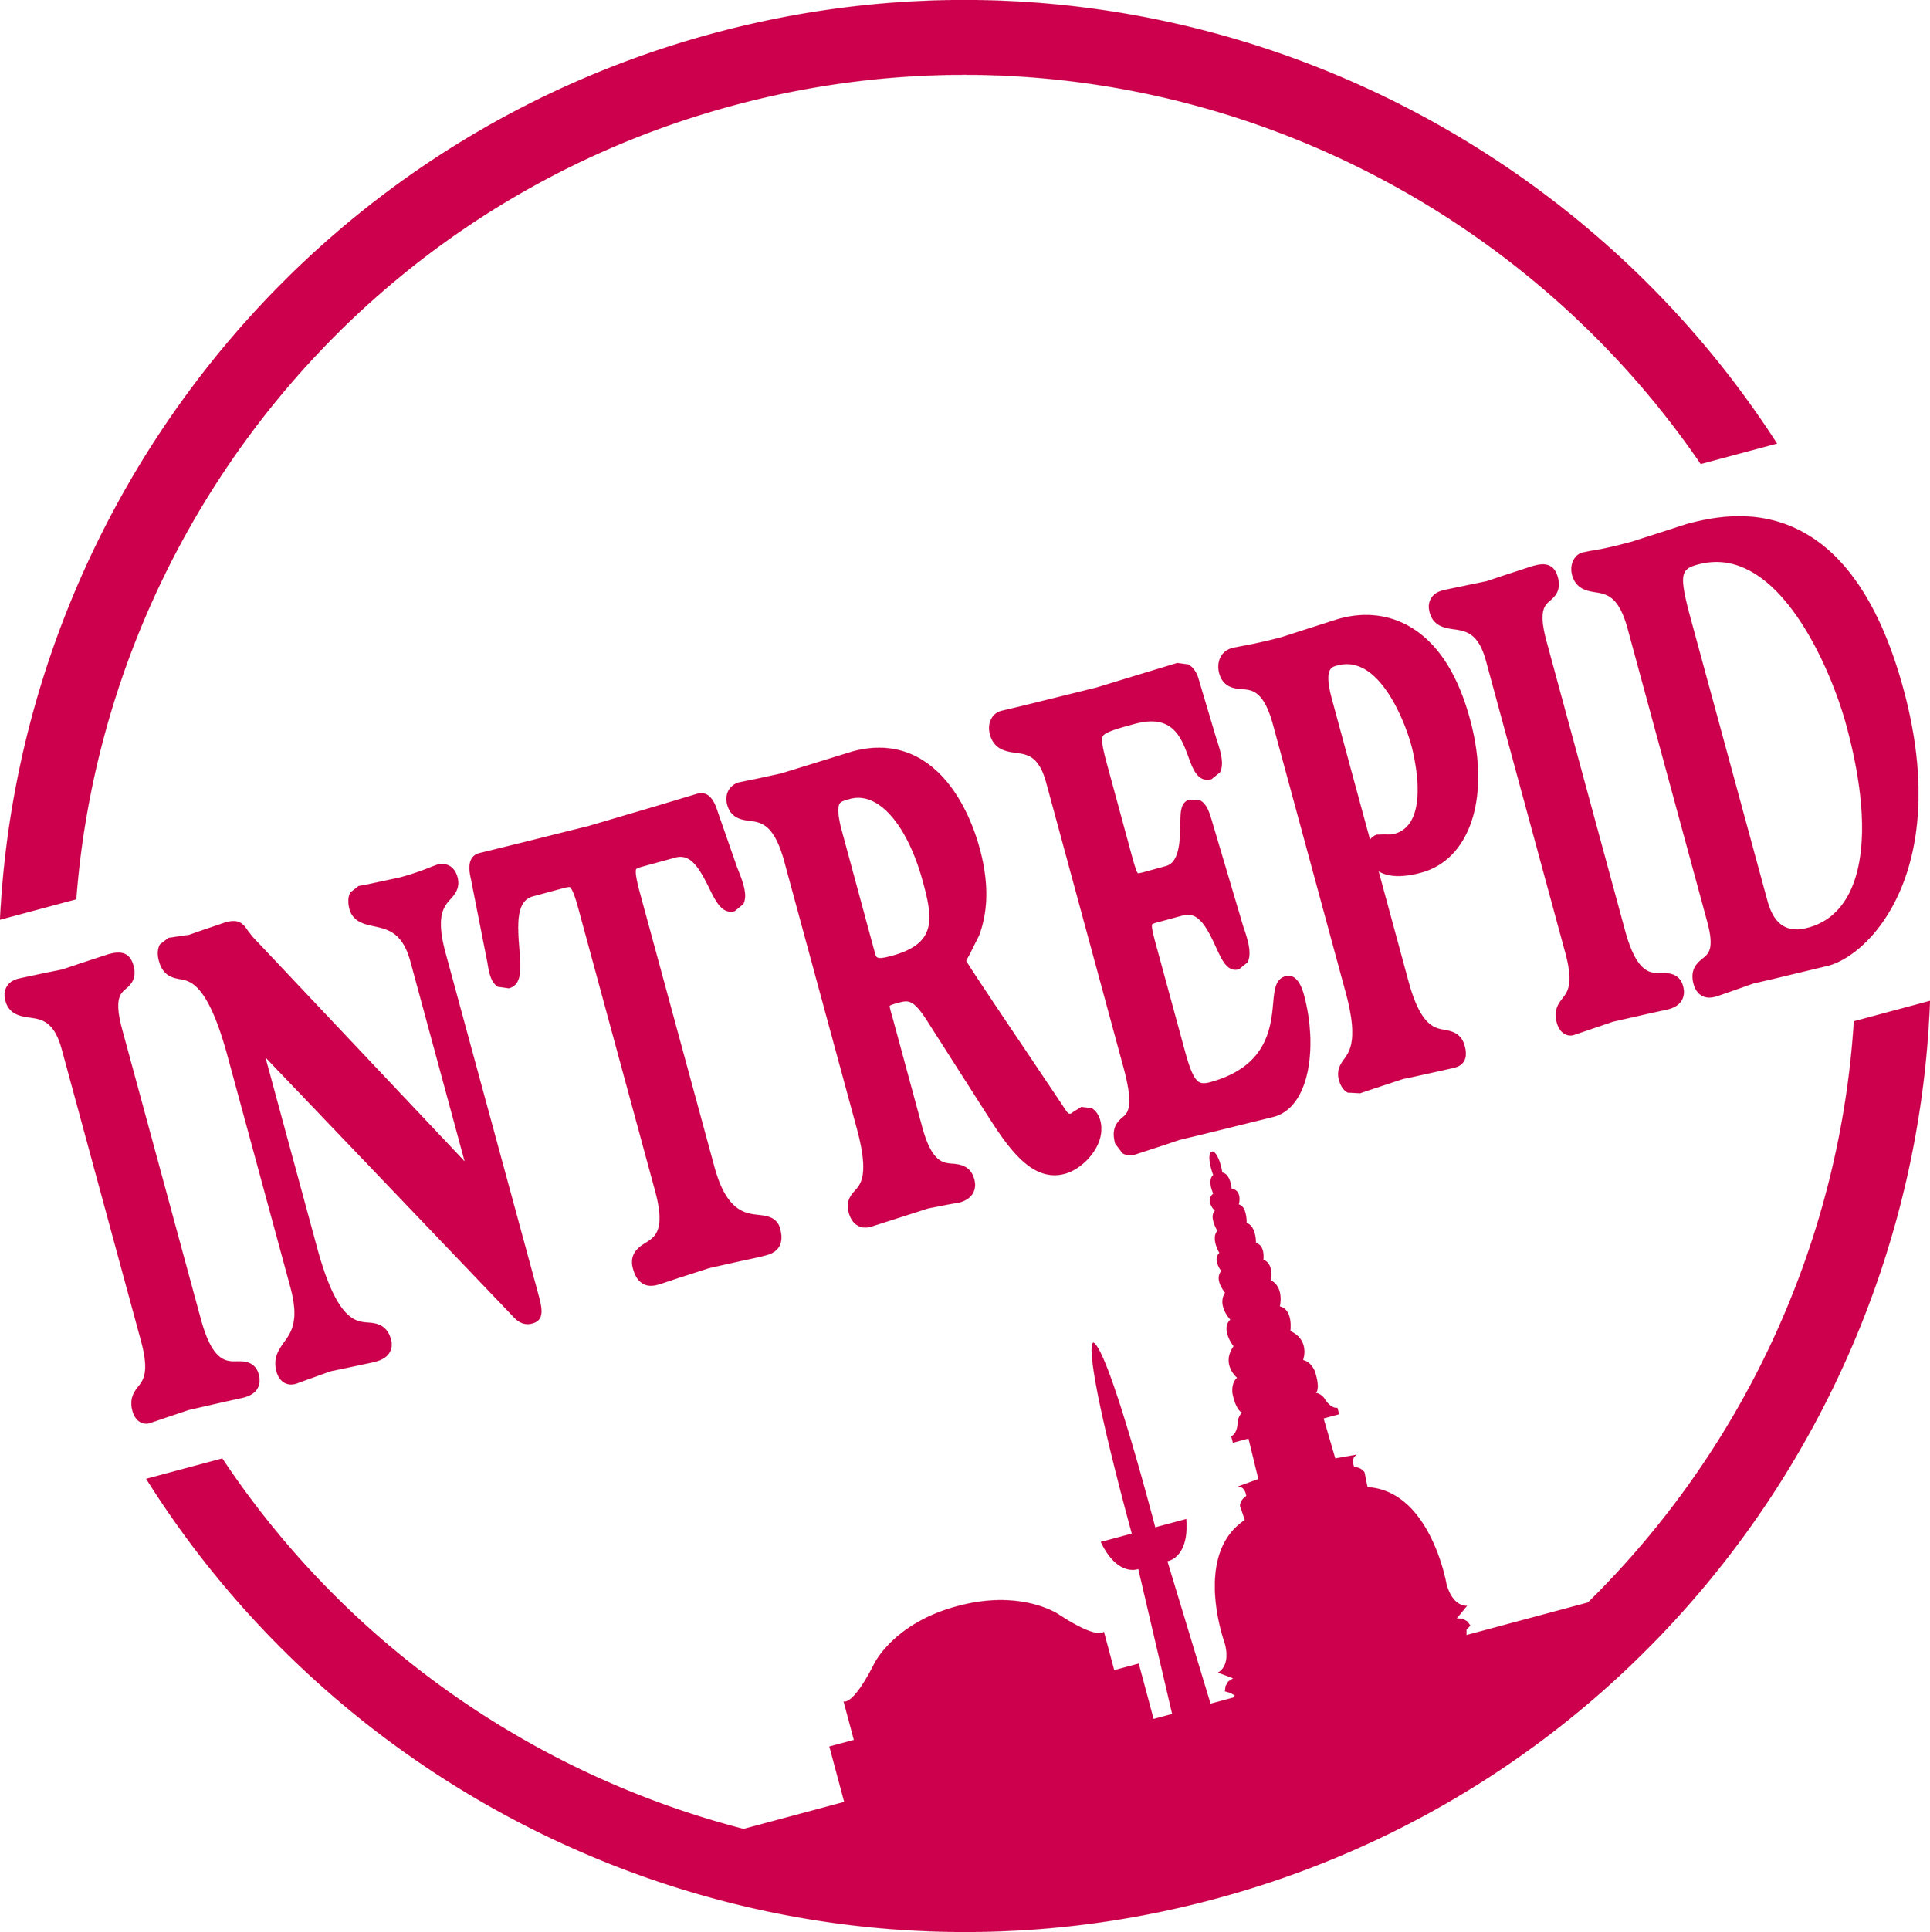 Intrepid_050518.jpg